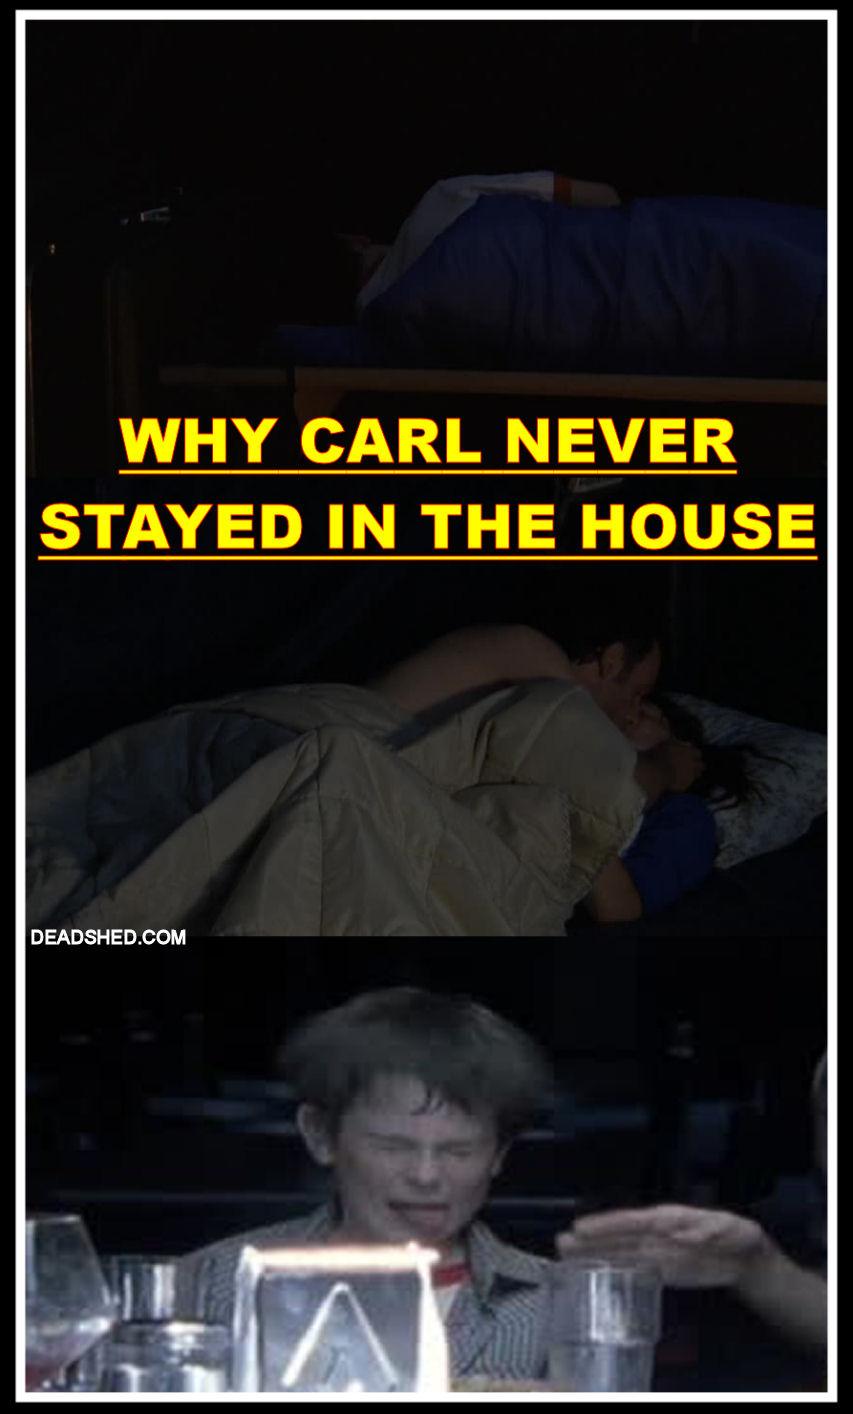 The_Walking_Dead_Season_1_Meme_Wheres_Carl_Reason_DeadShed deadshed productions the walking dead season 1 memes *updated*